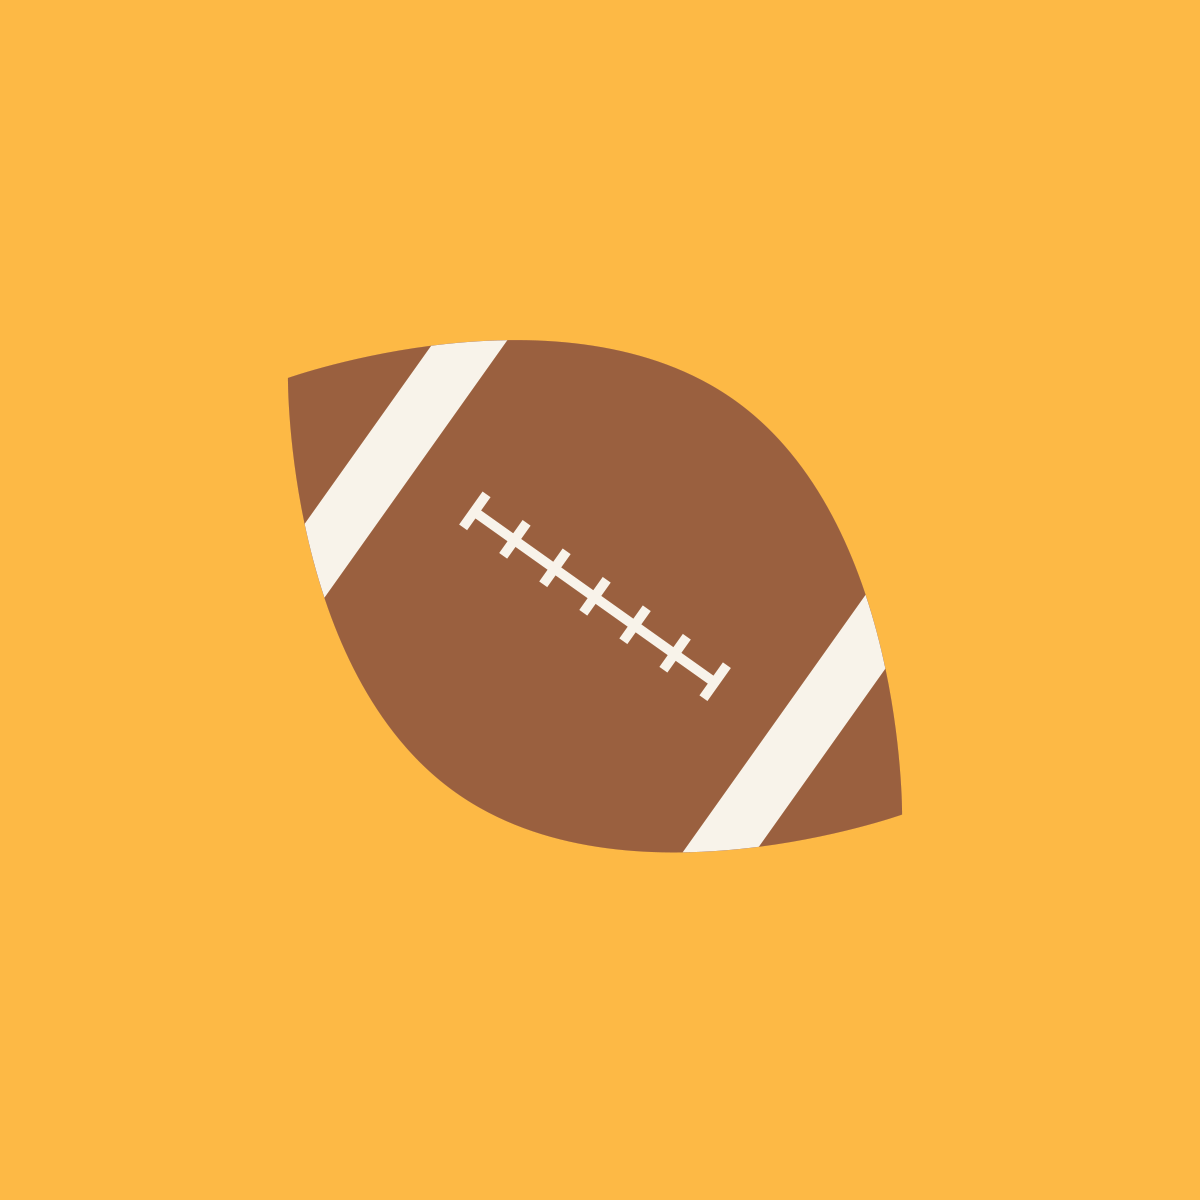 97 american football